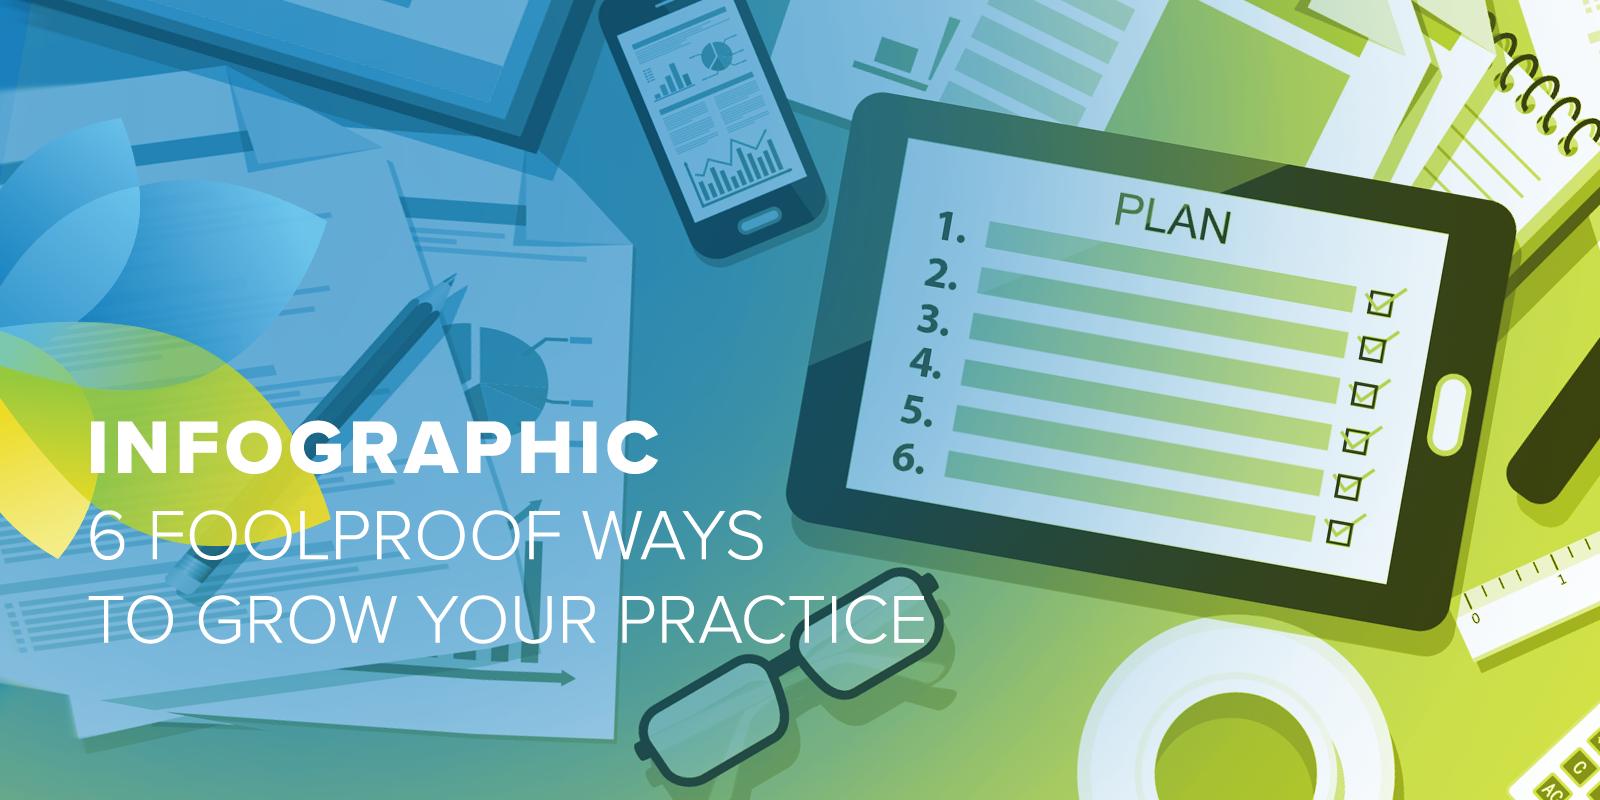 CF-Infographic_6-Foolproof-Ways_Blog-Header.png